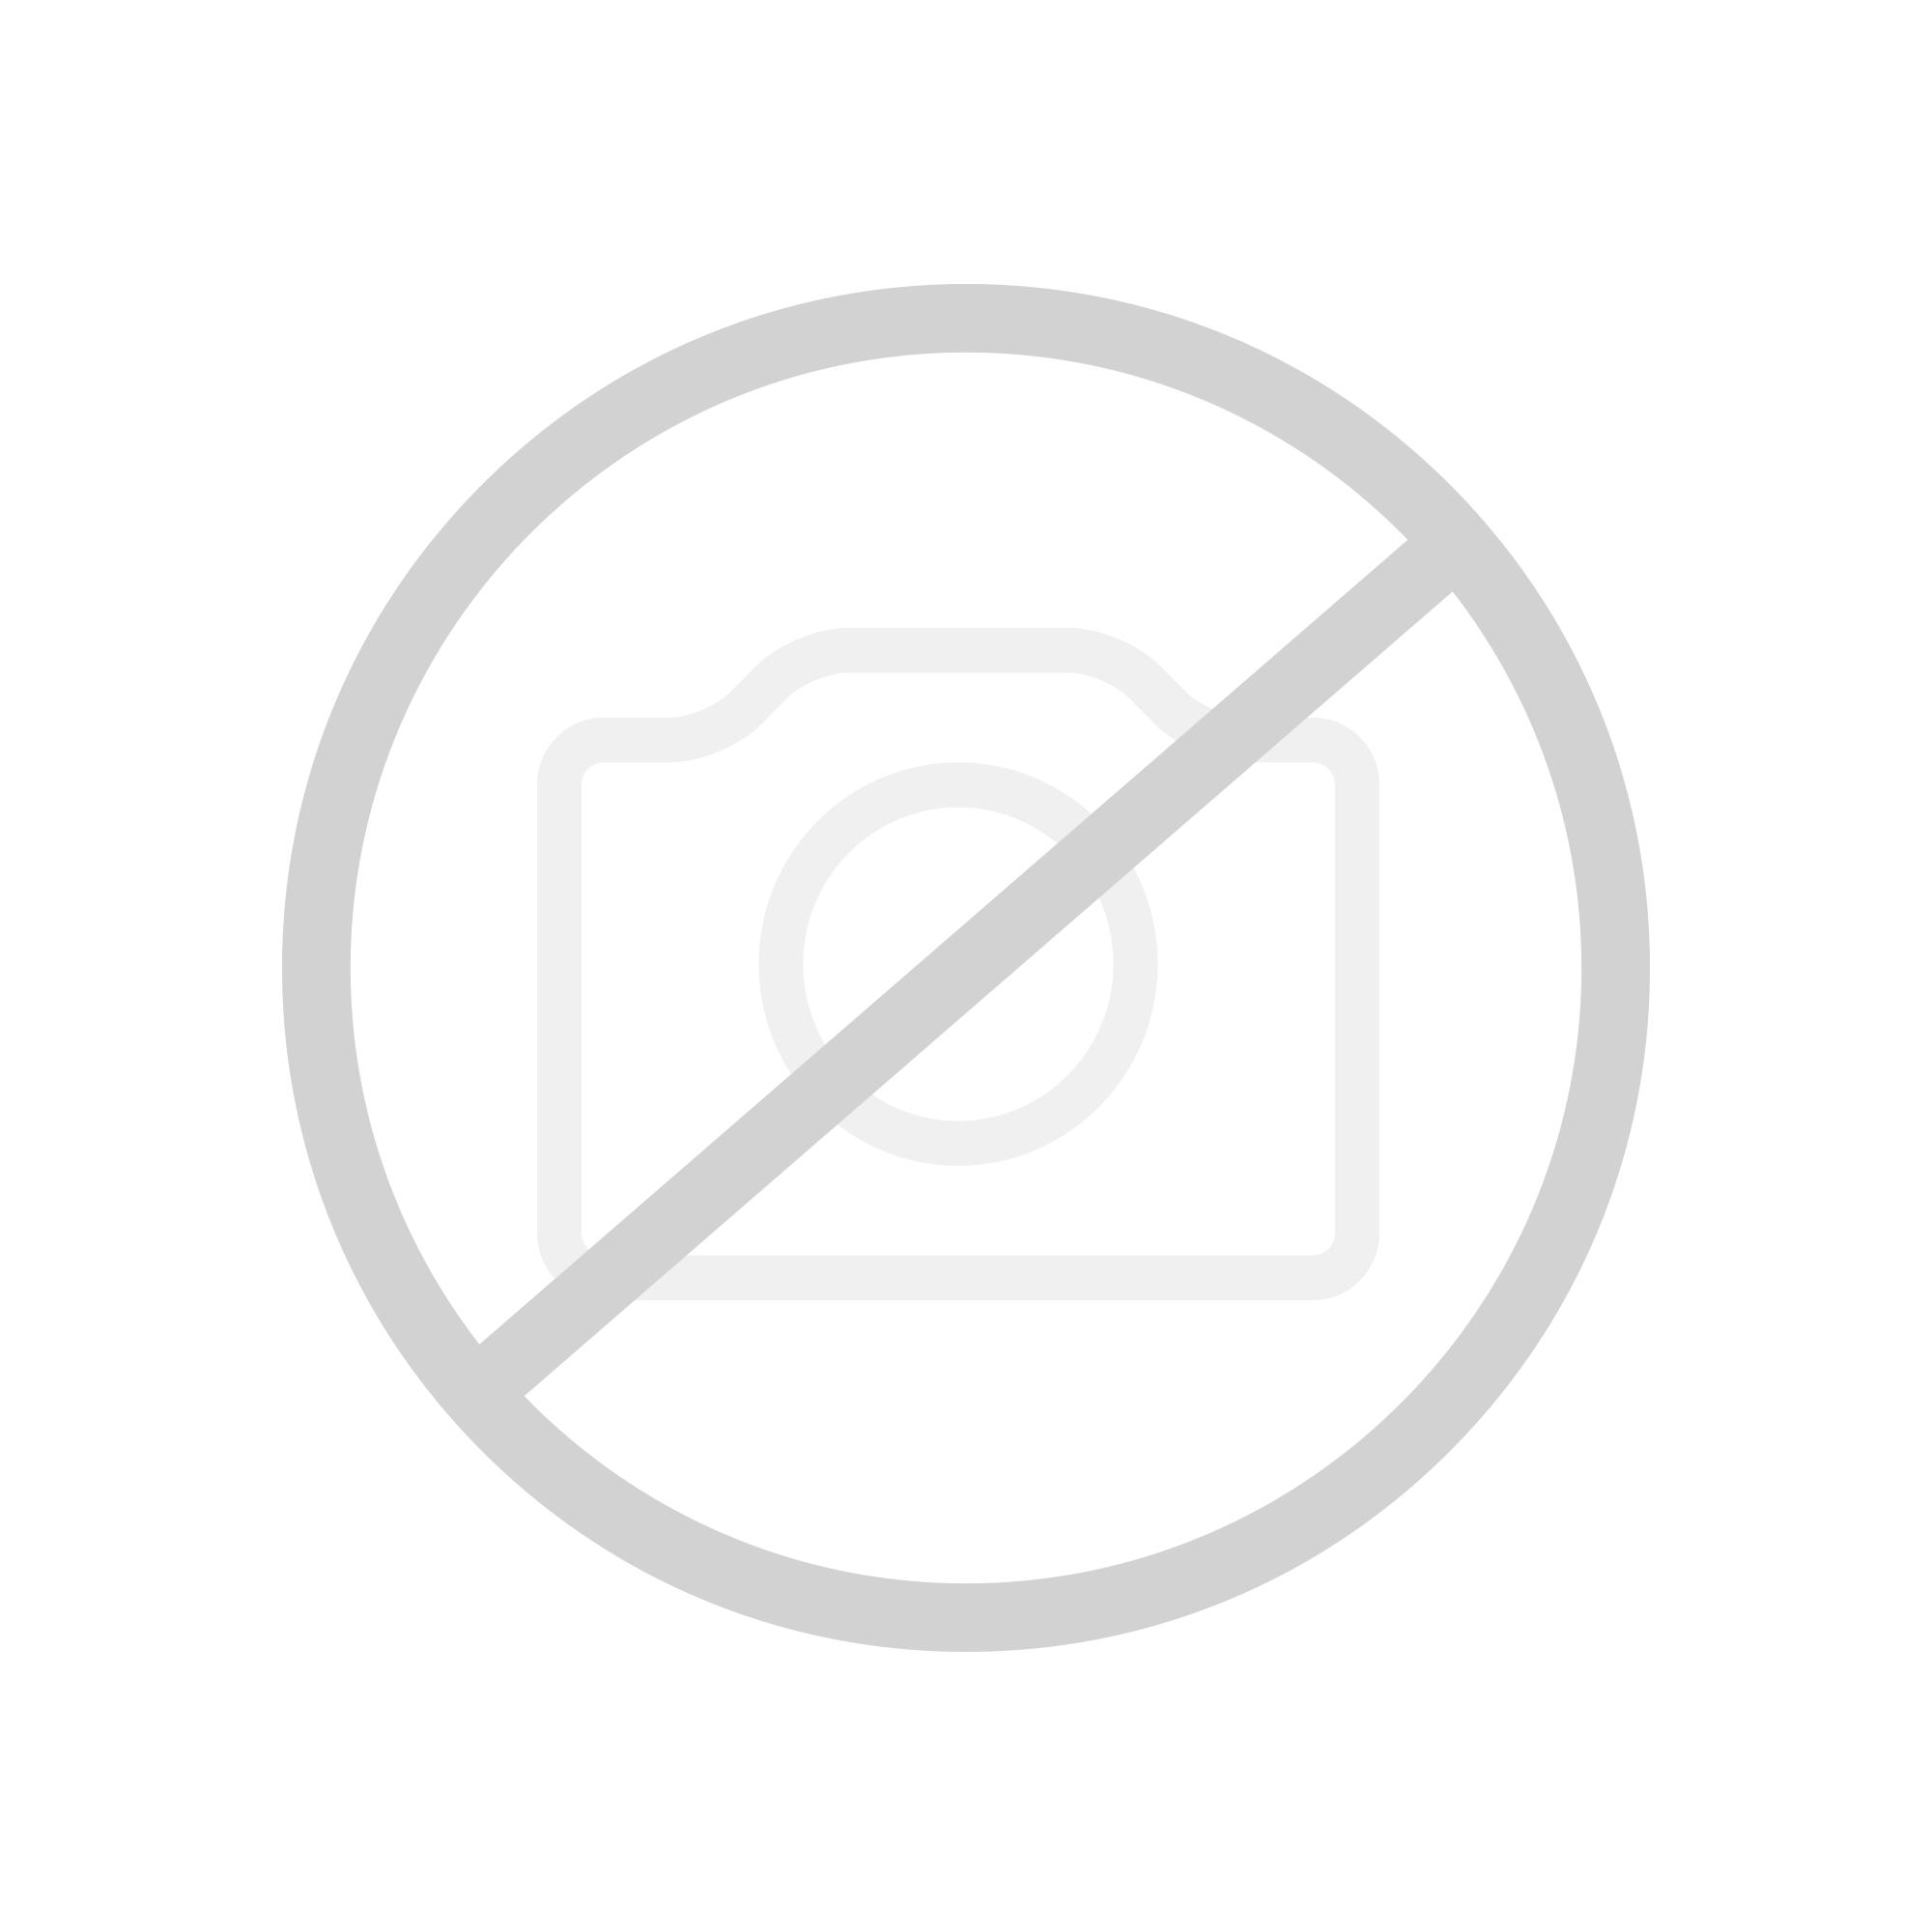 joop bathline beh lter quadratisch grau 011031413 reuter onlineshop. Black Bedroom Furniture Sets. Home Design Ideas